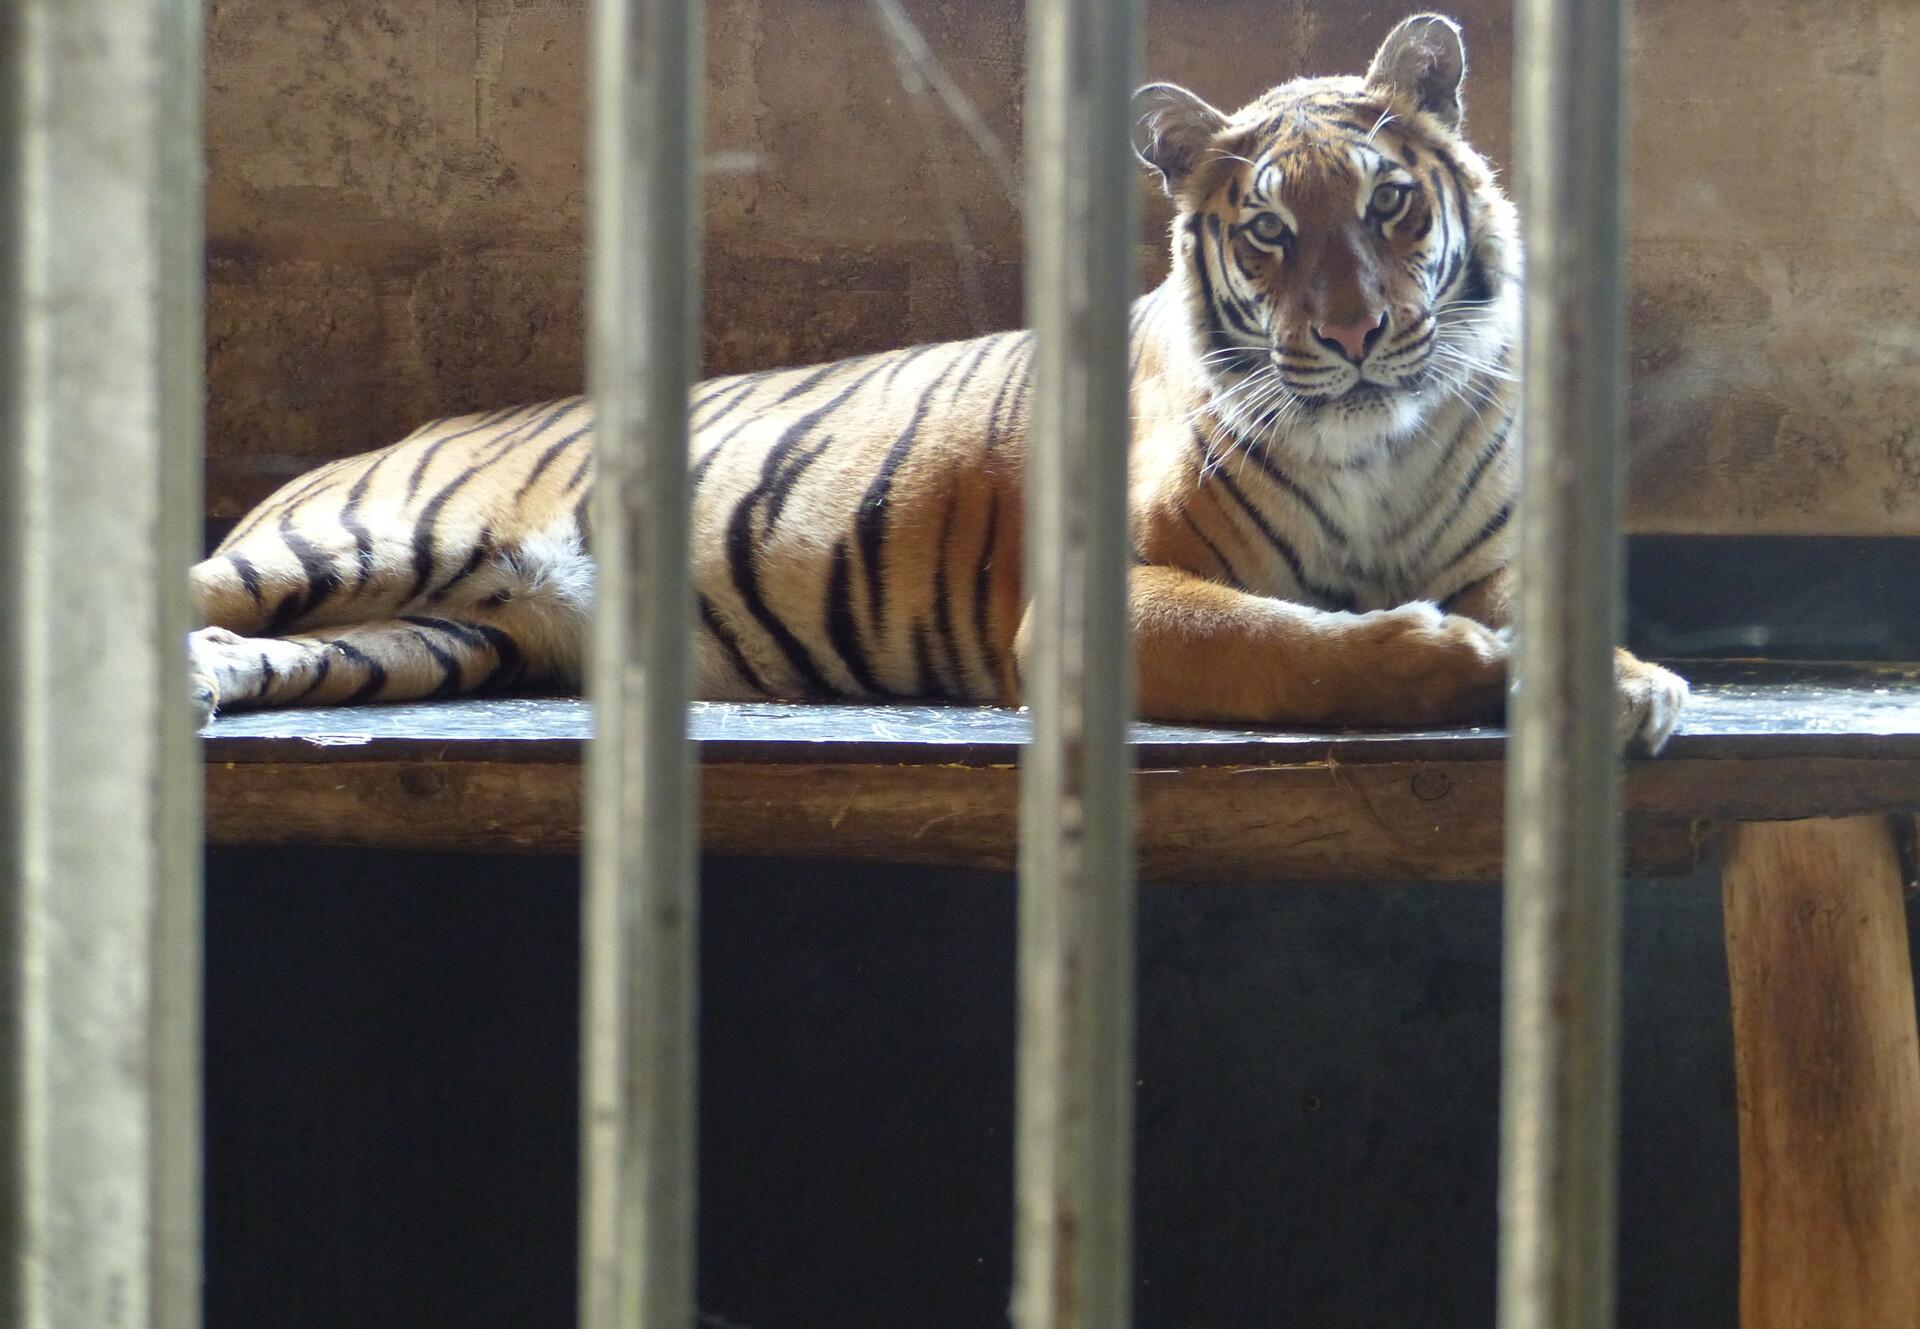 Tiger Trade in Europe